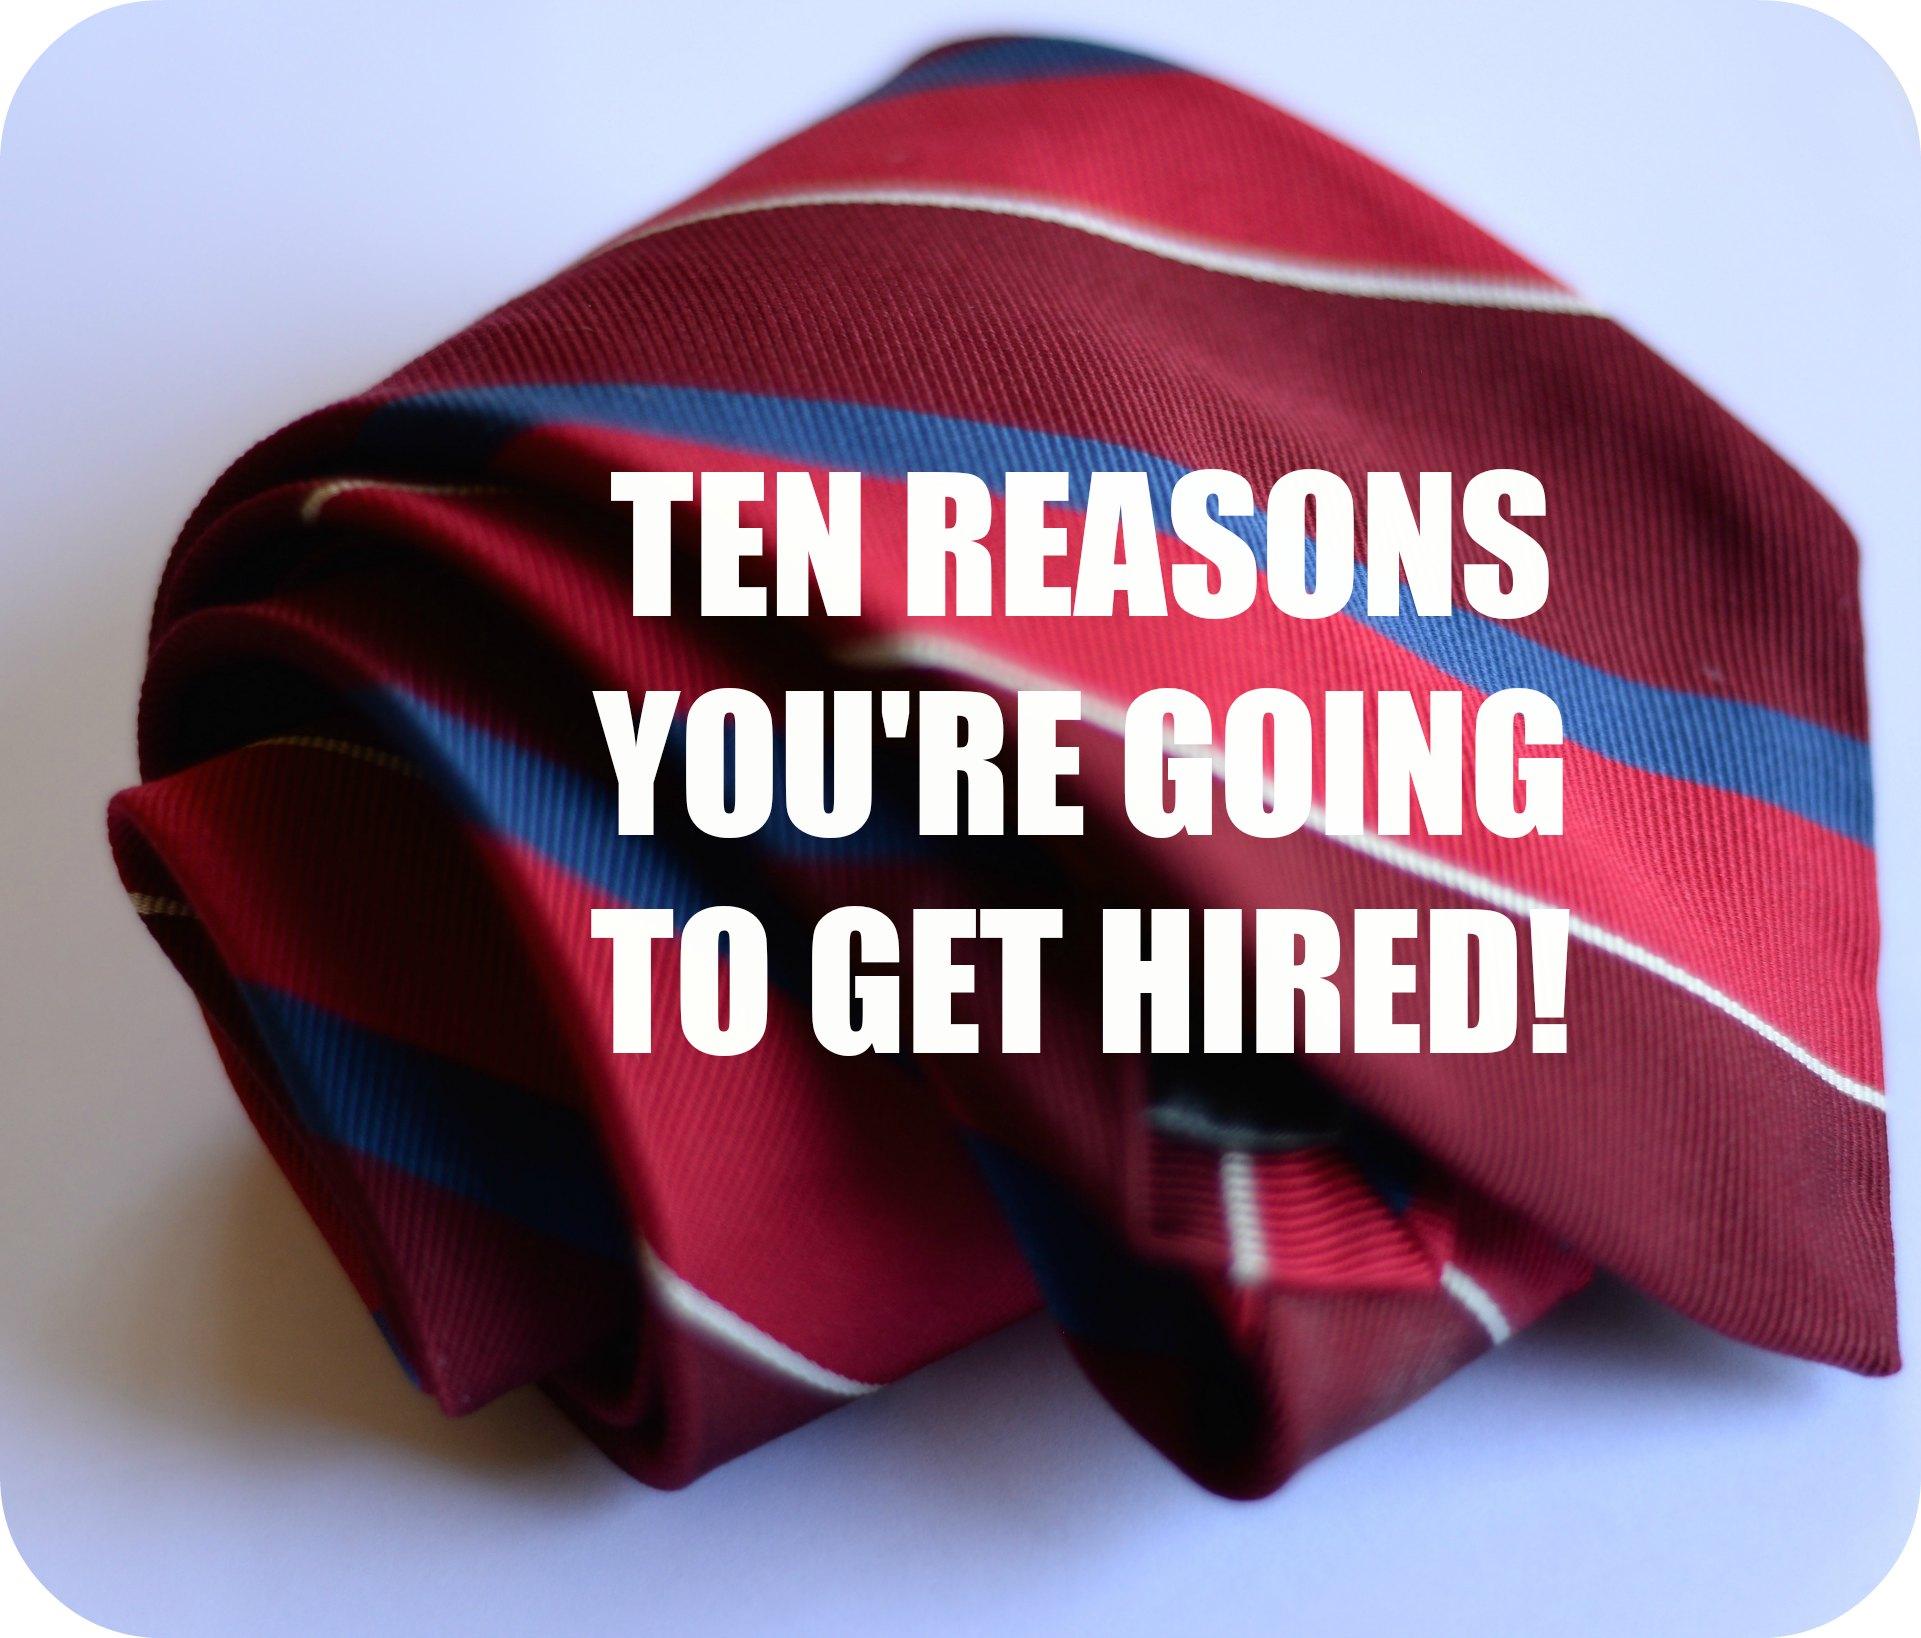 Ten Reasons Get Hired